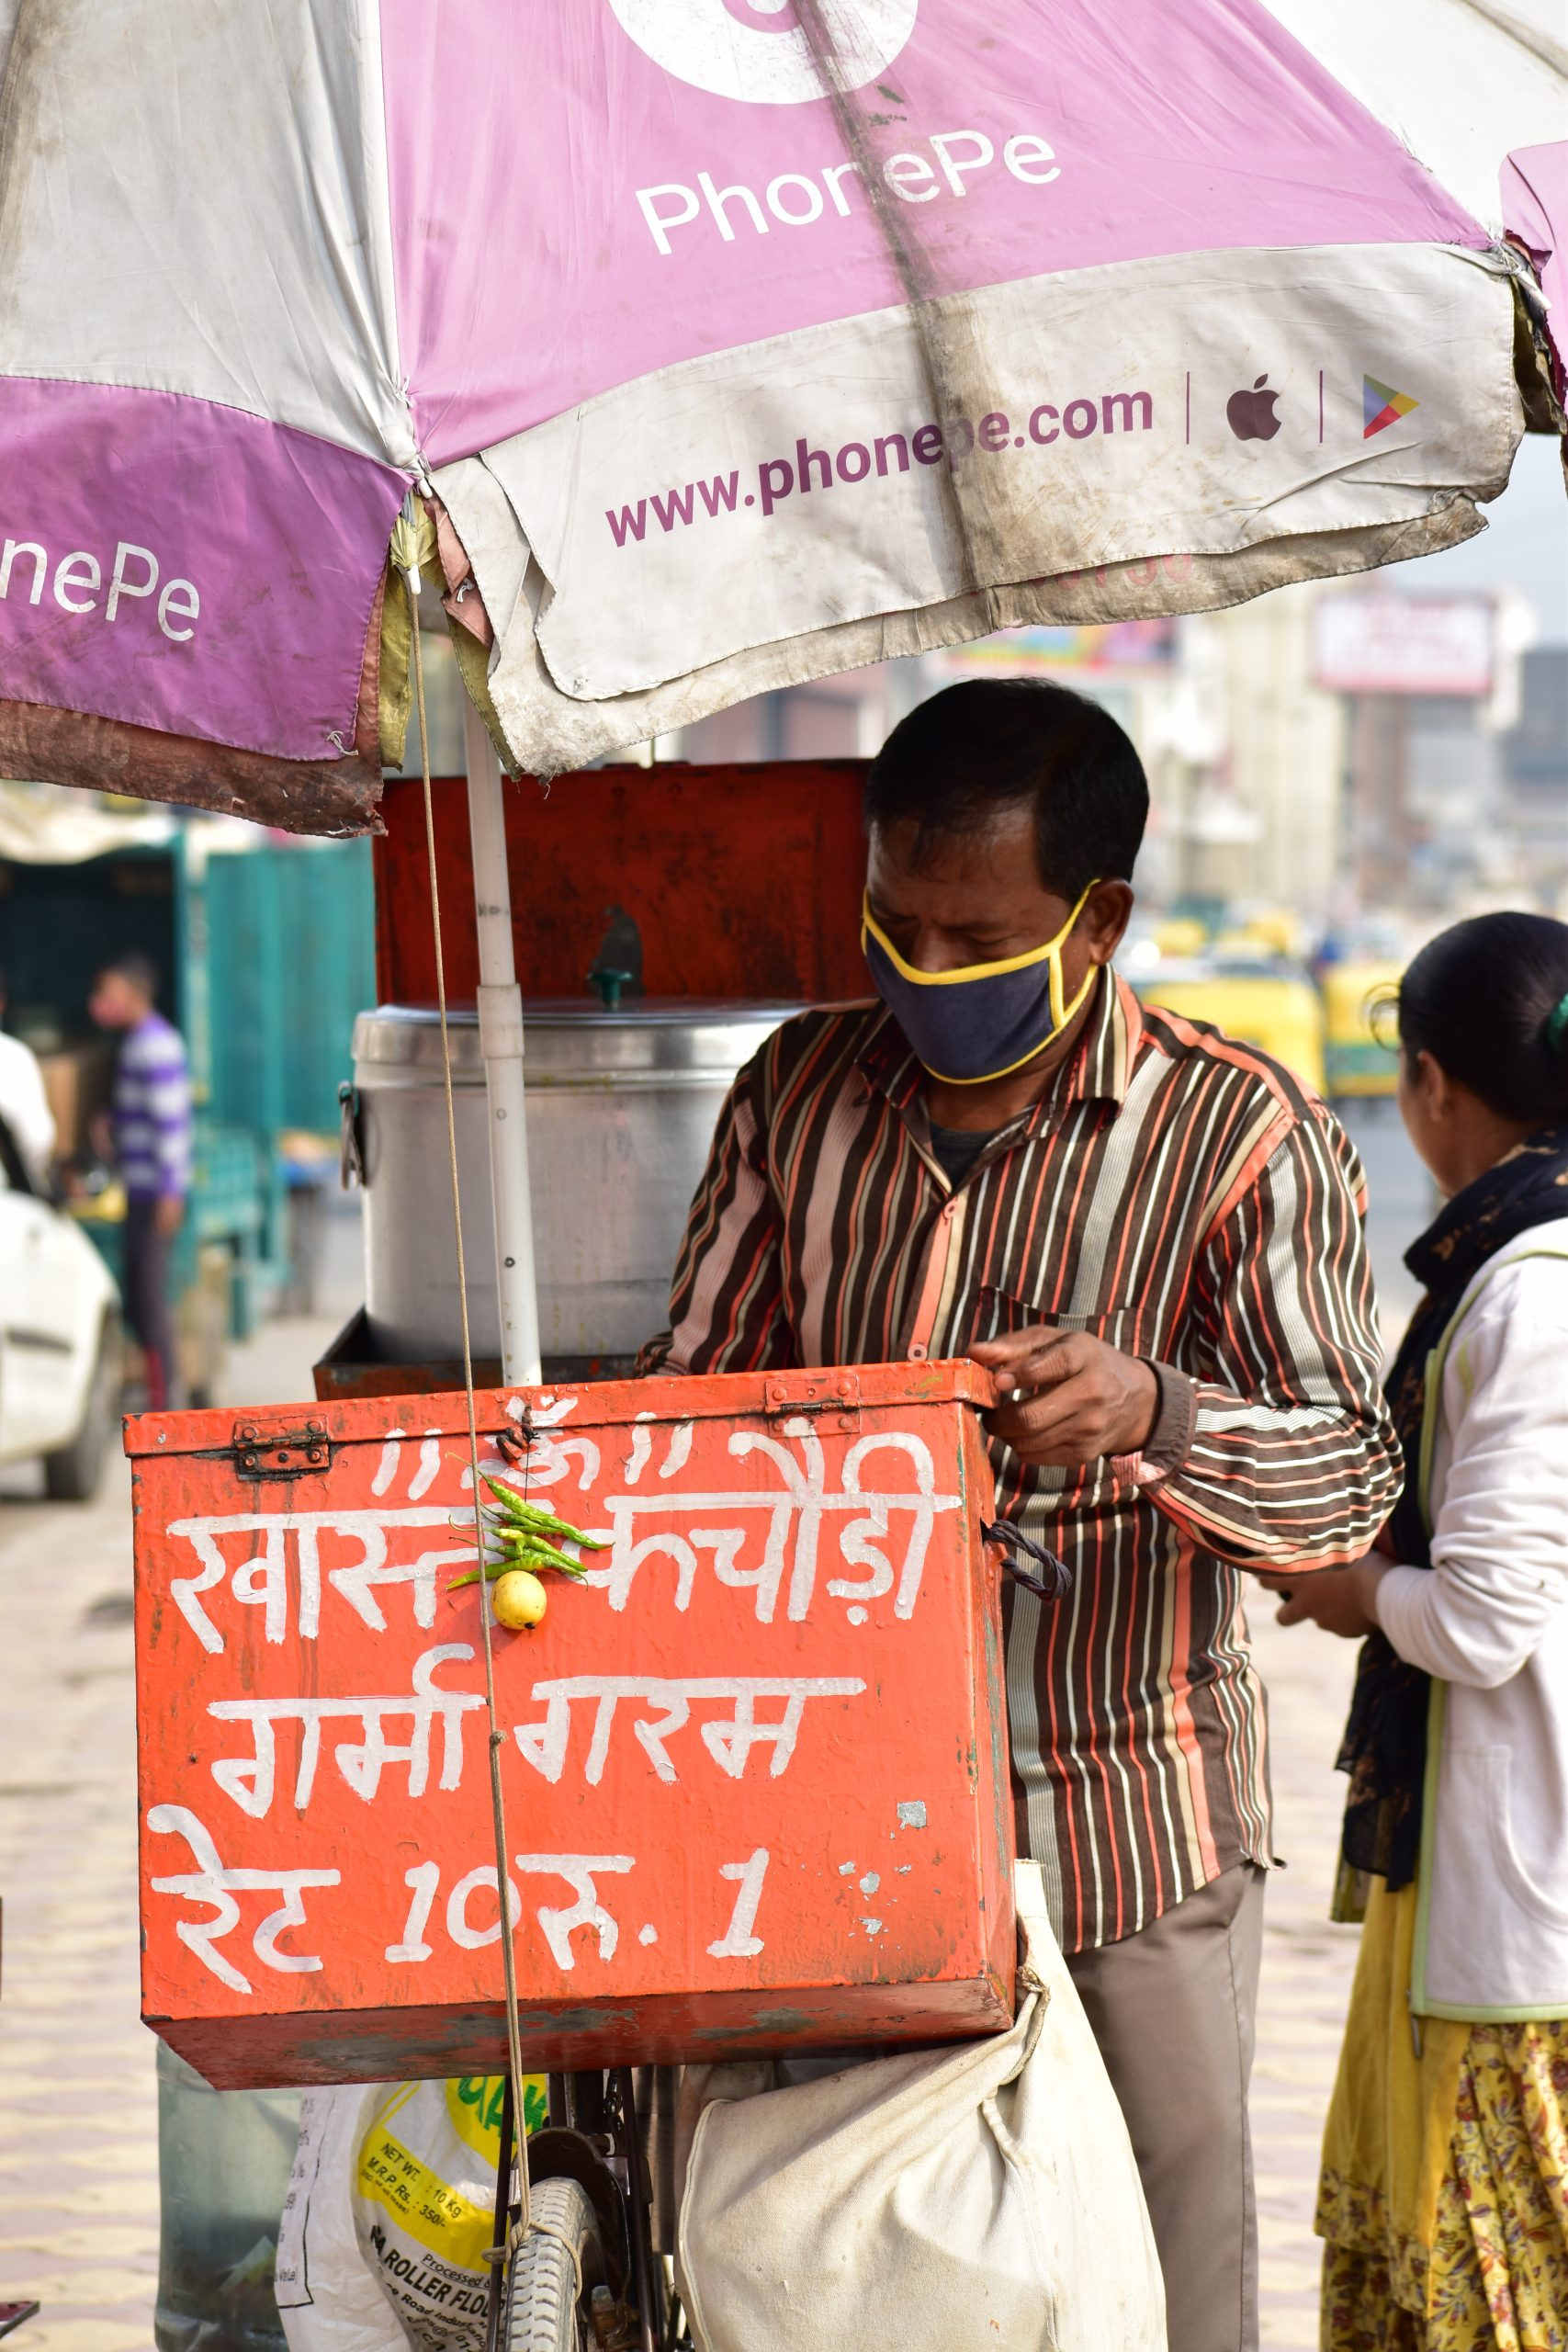 A guy selling kachoris on street